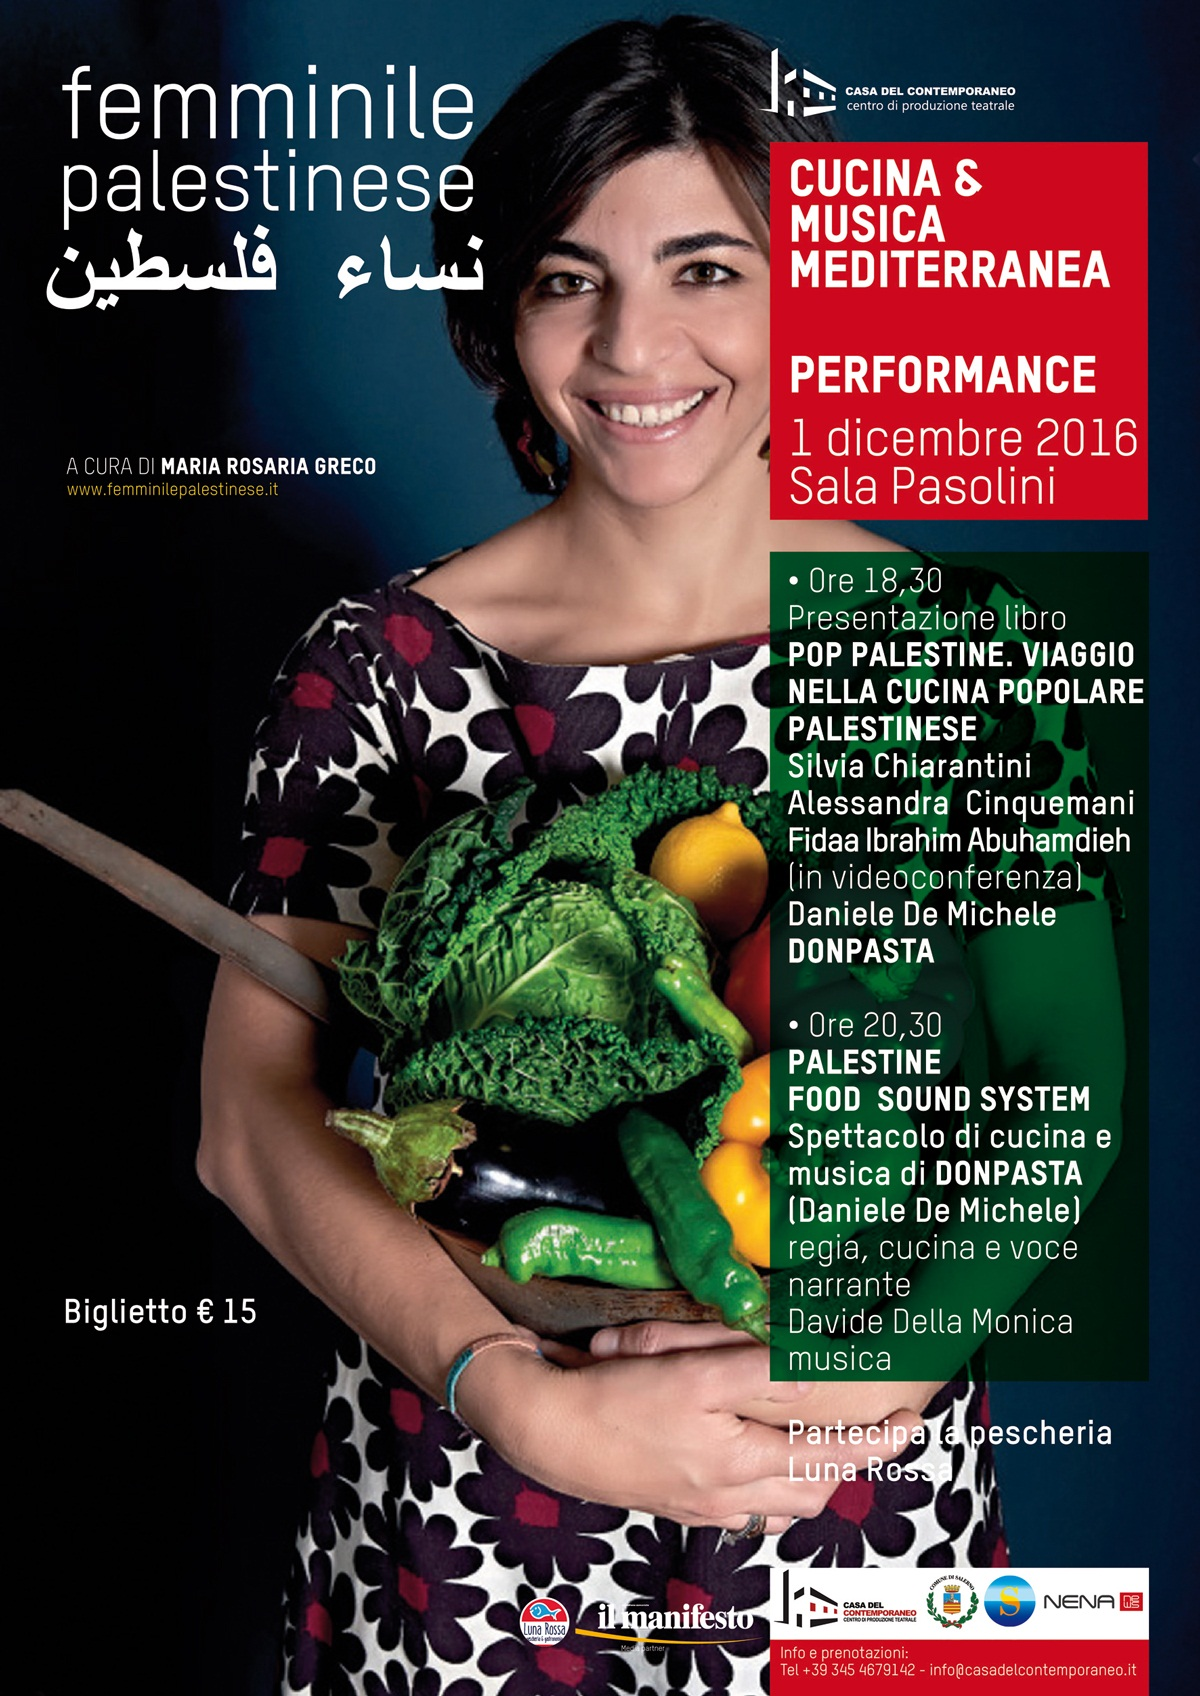 Cucina e musica mediterranea